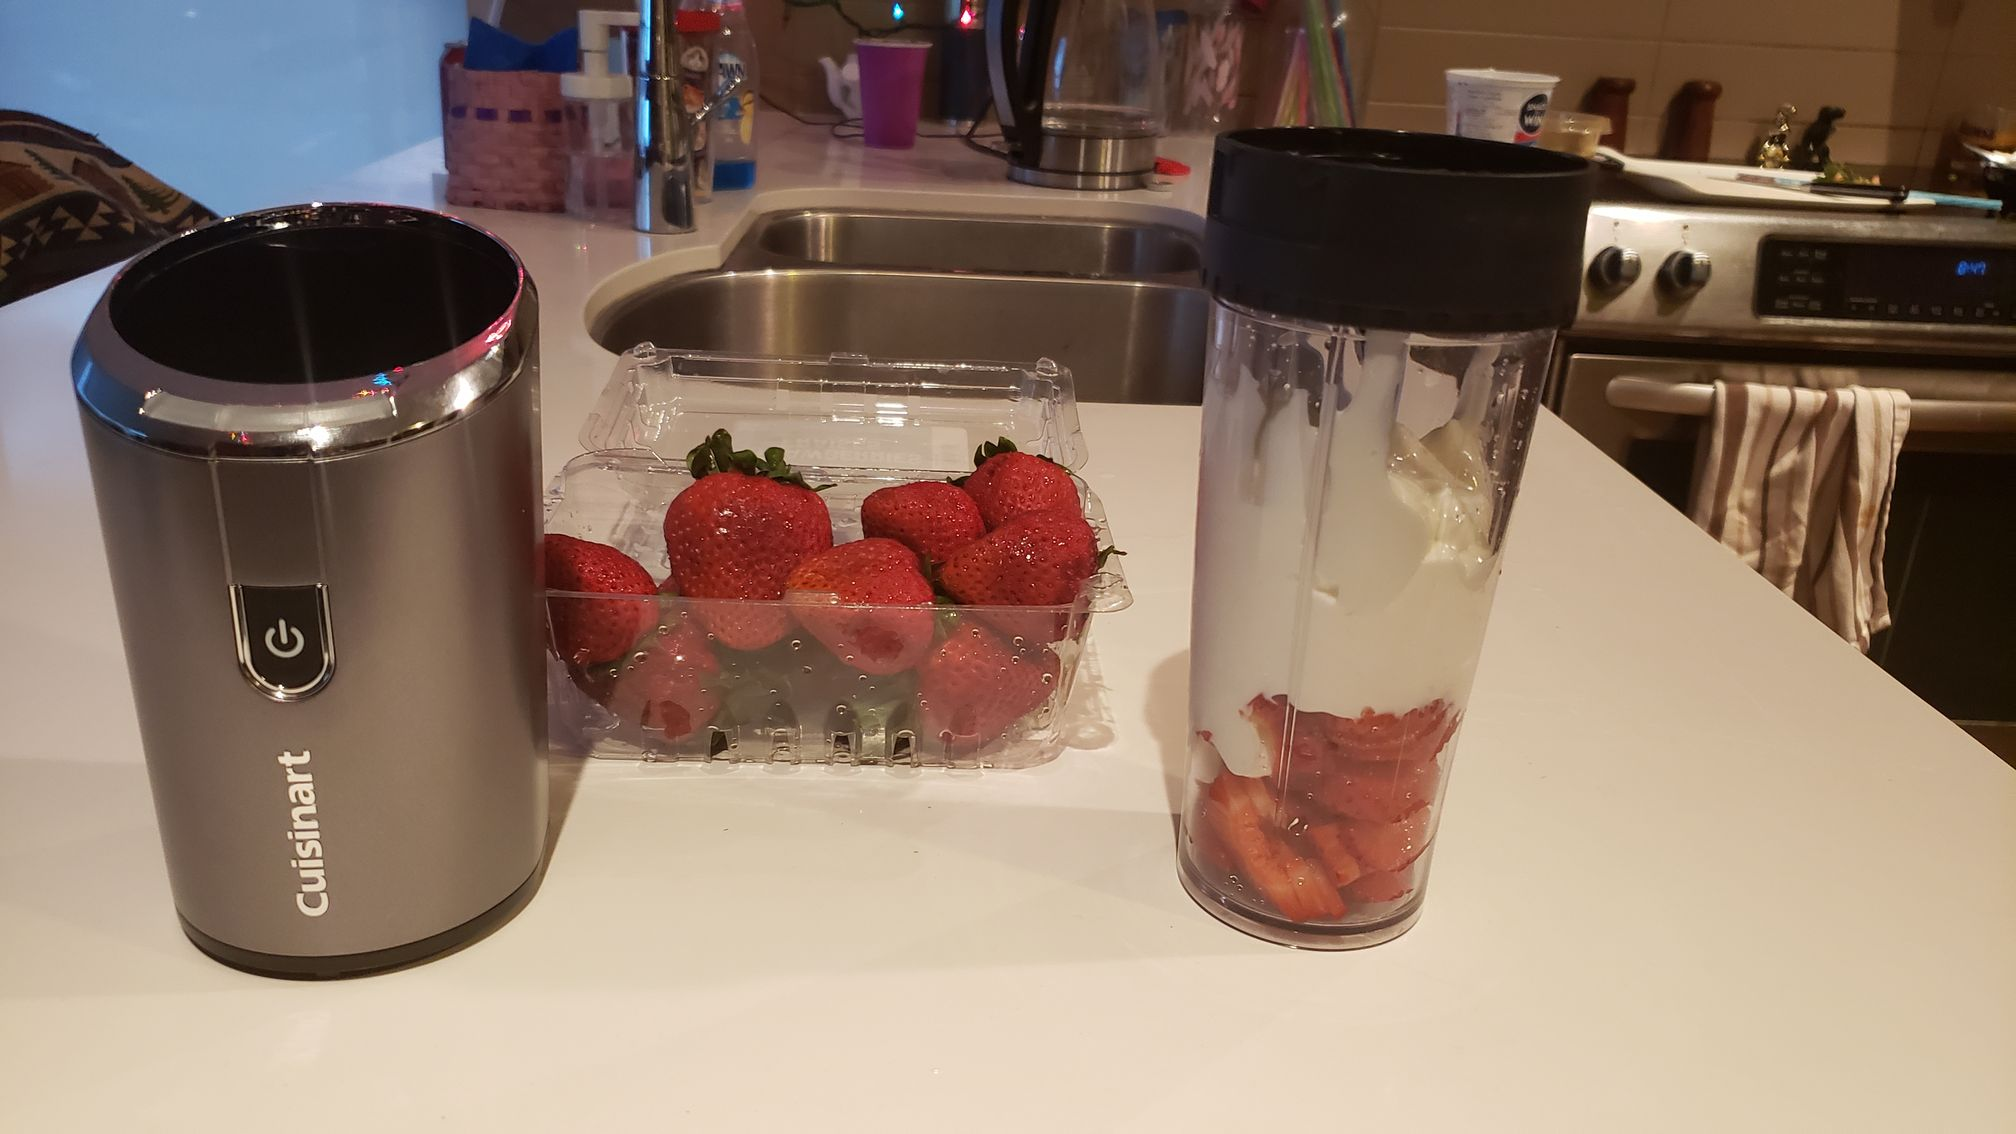 image of blender base next to fresh strawberries and tumbler full of ingredients